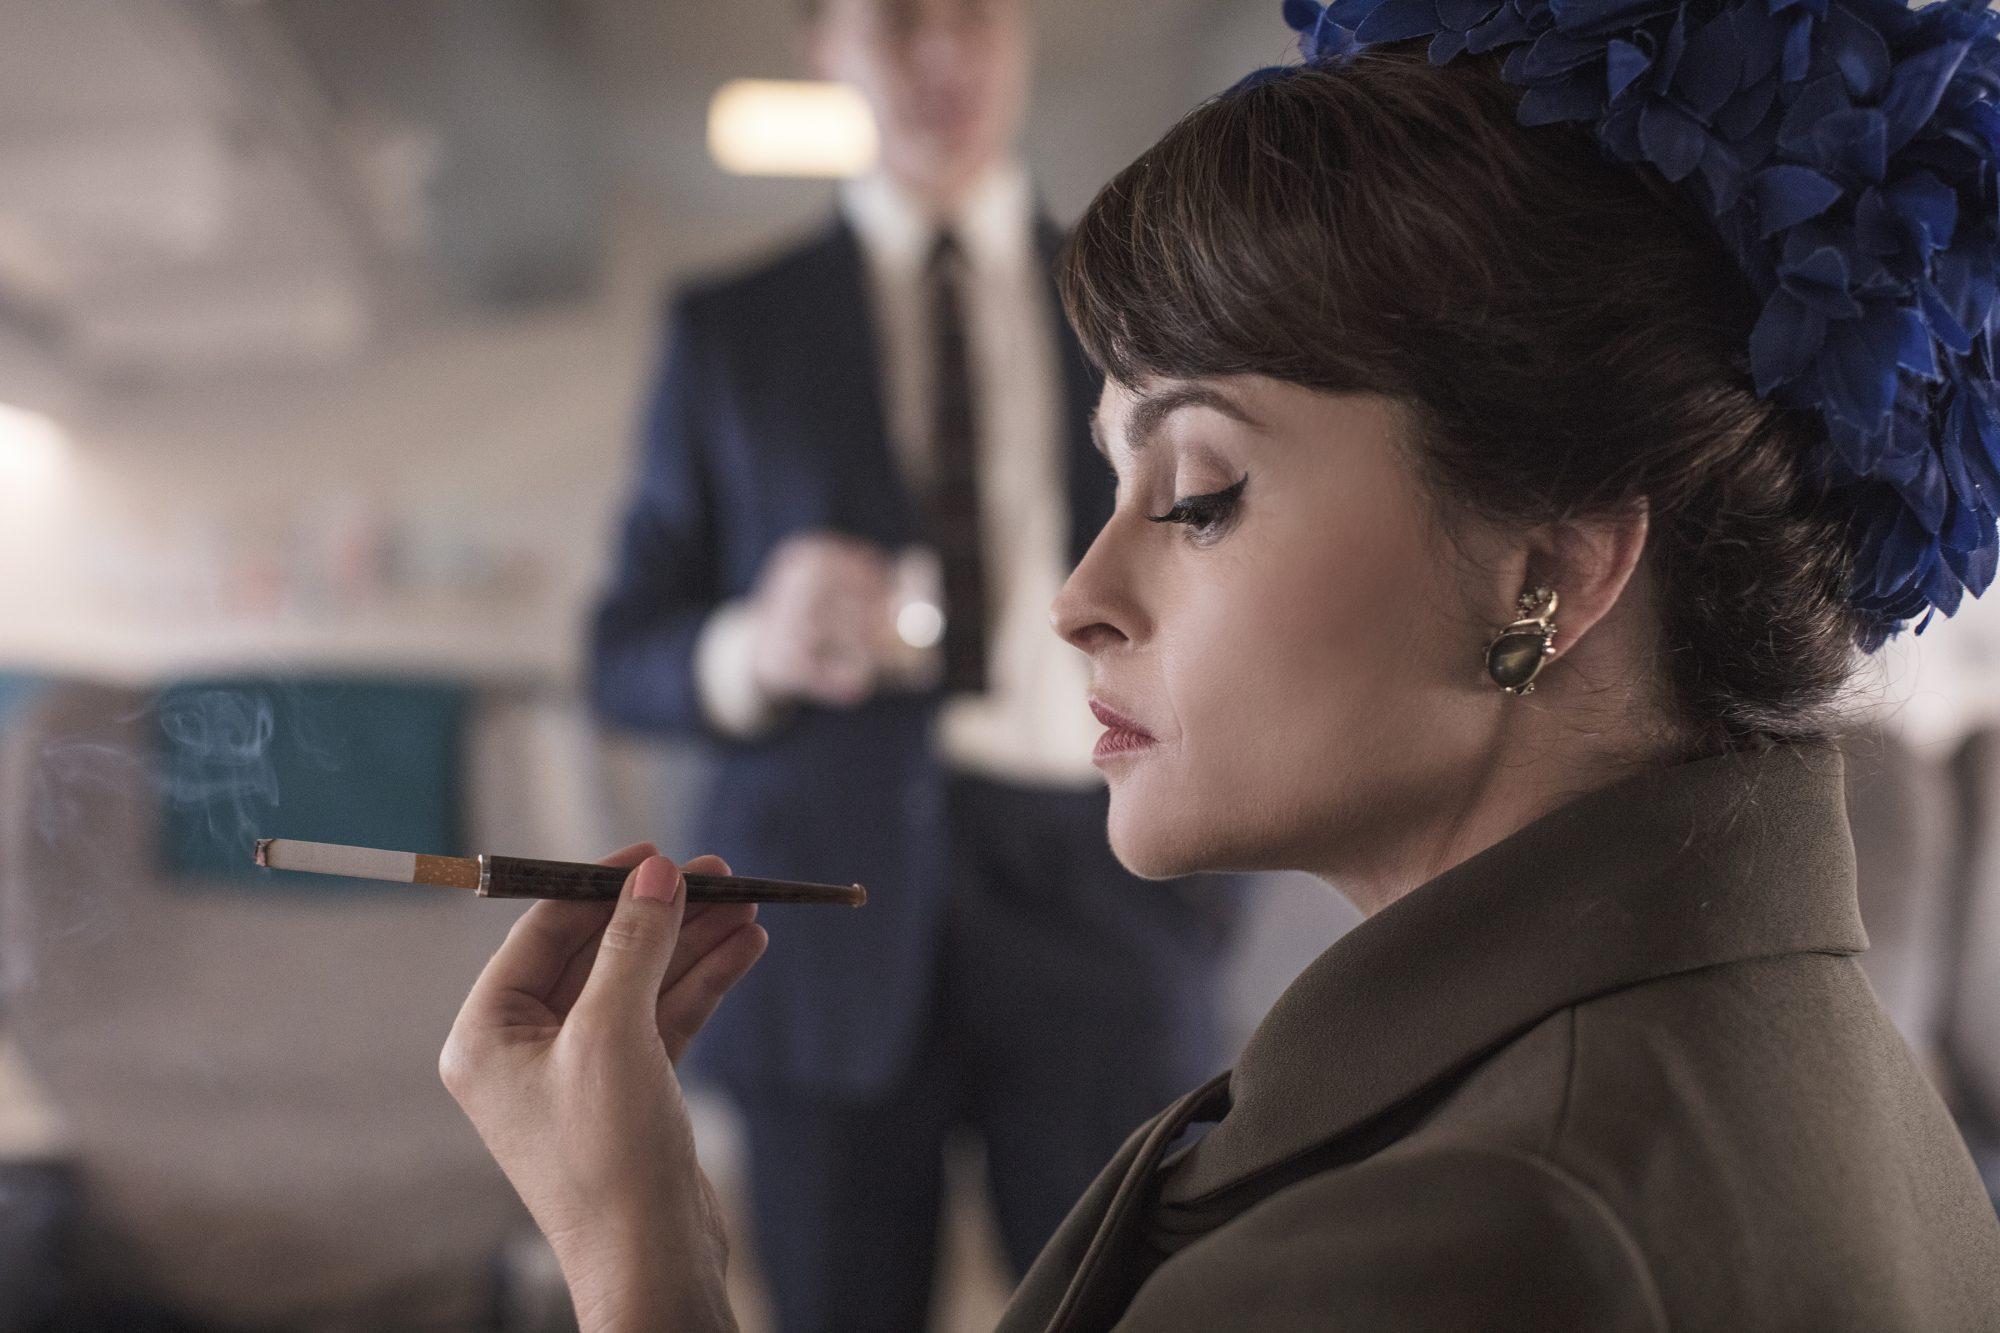 Helena Bonham Carter as Princess Margaret in 'The Crown'